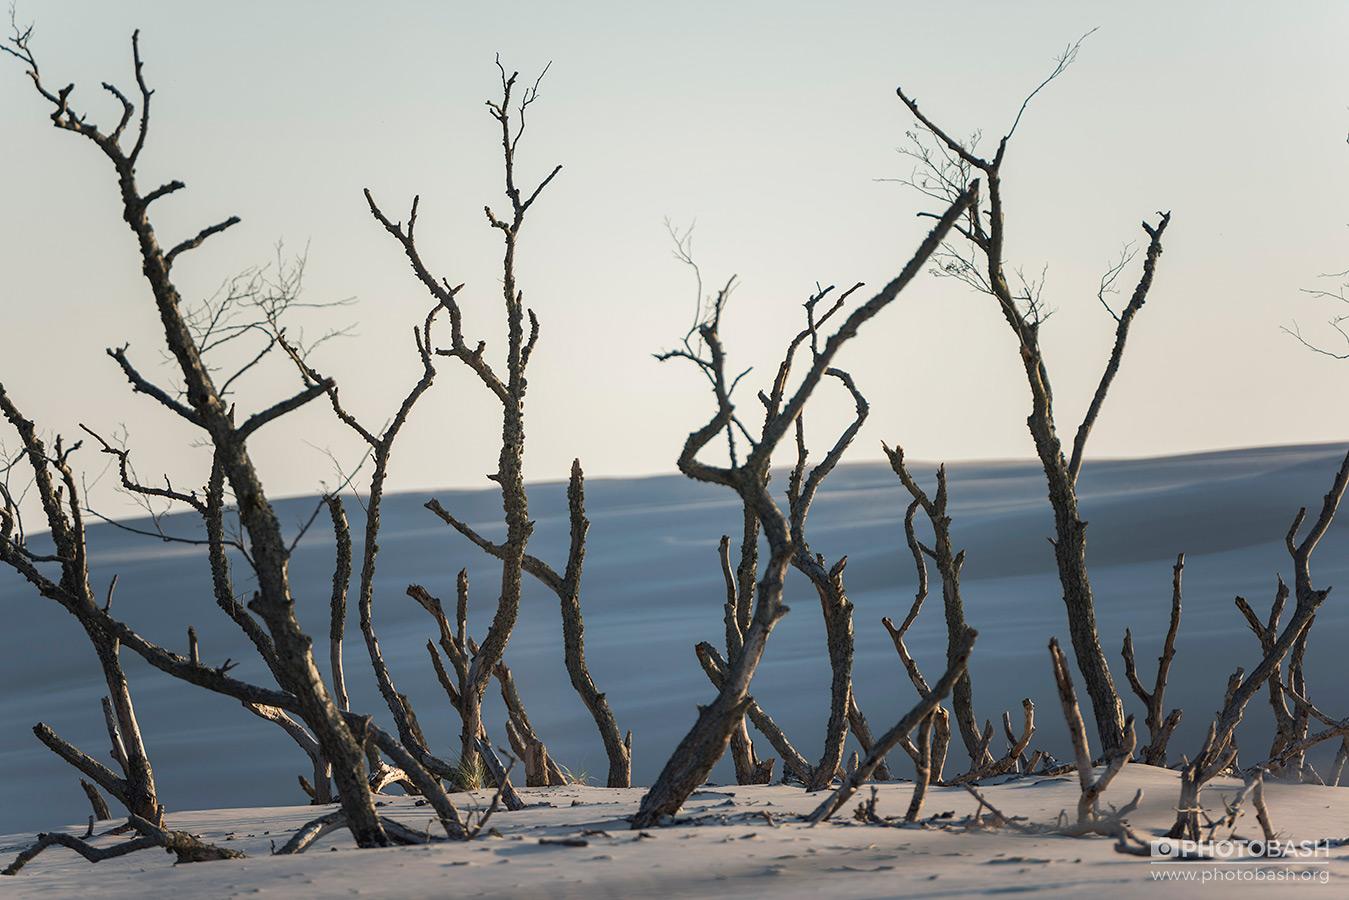 Coastal-Dunes-Beach-Dead-Plants.jpg